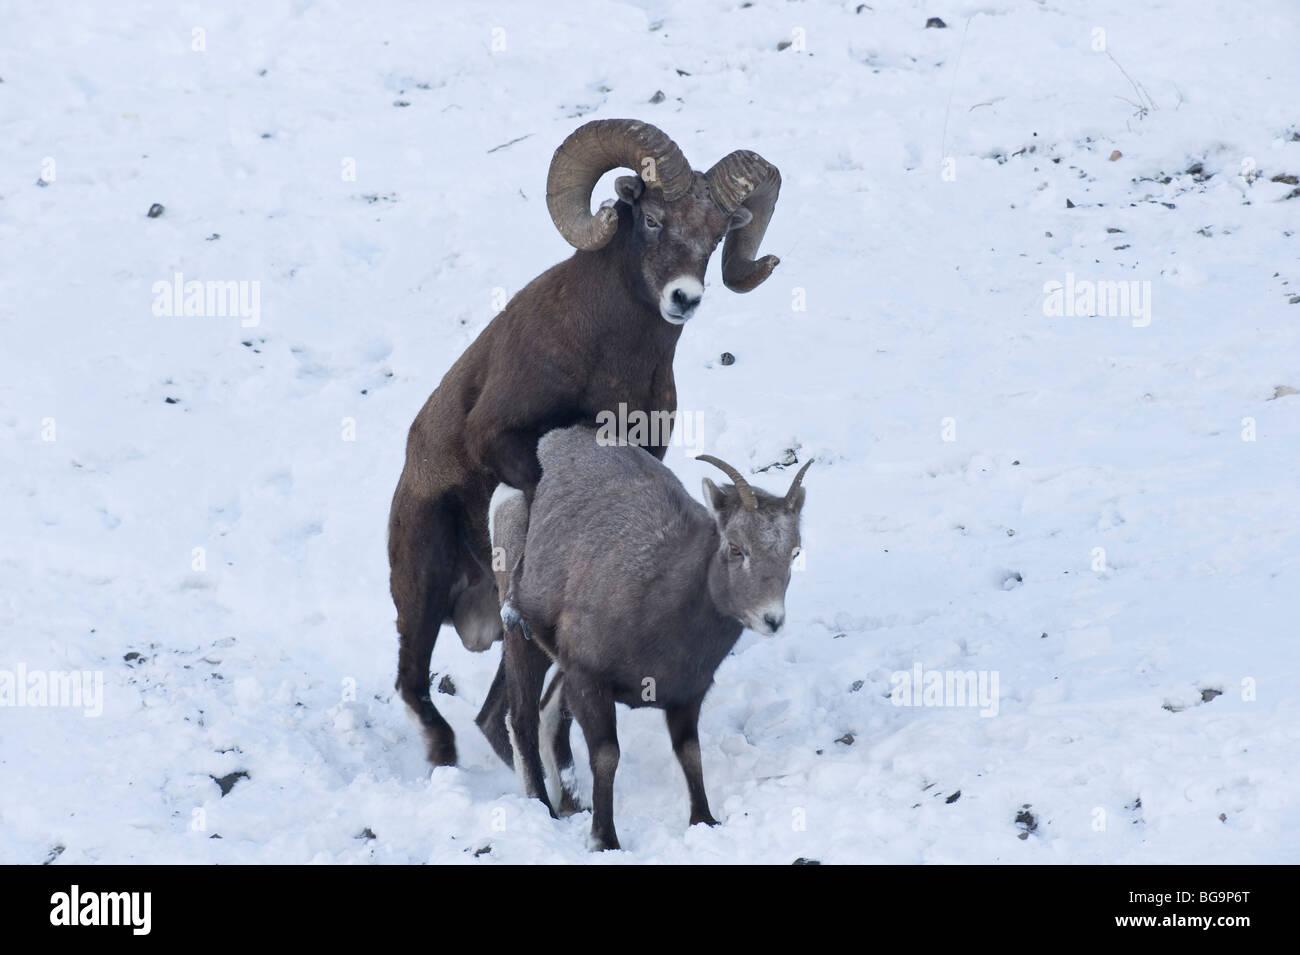 Bighorn Sheep mating - Stock Image